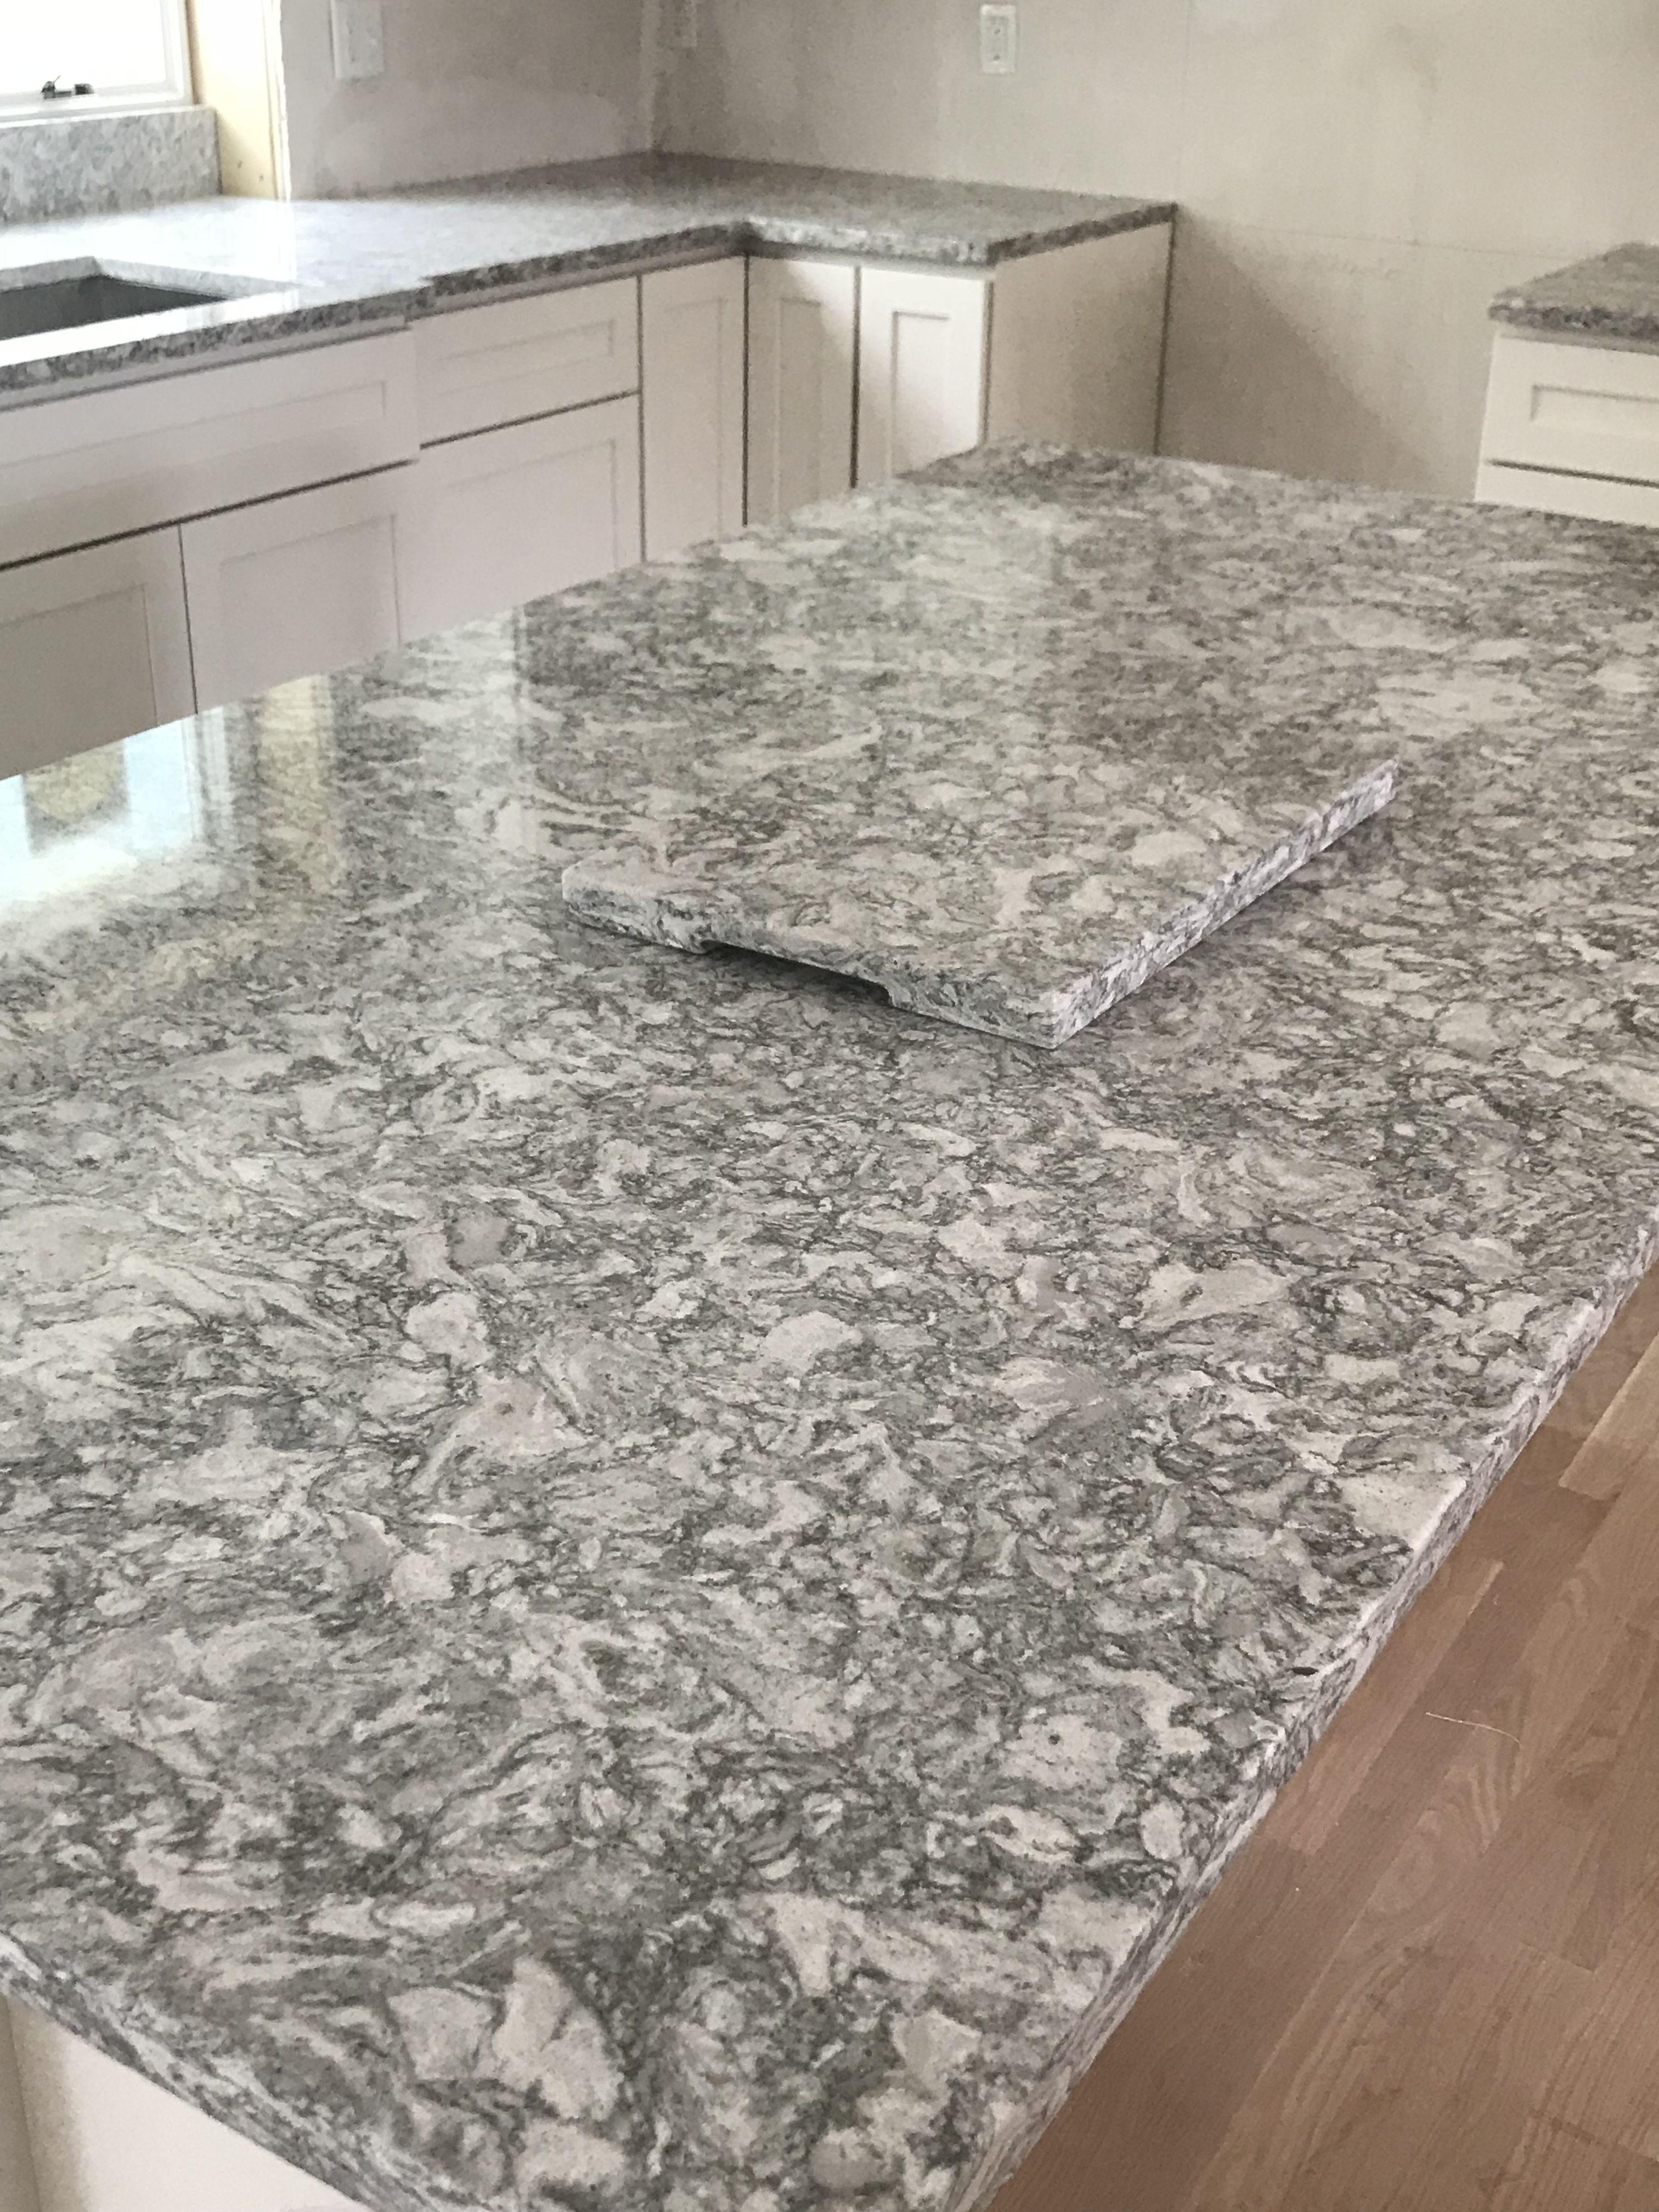 Berwyn Cambria Kitchen: Cambria Berwyn Quartz Countertops In 2019